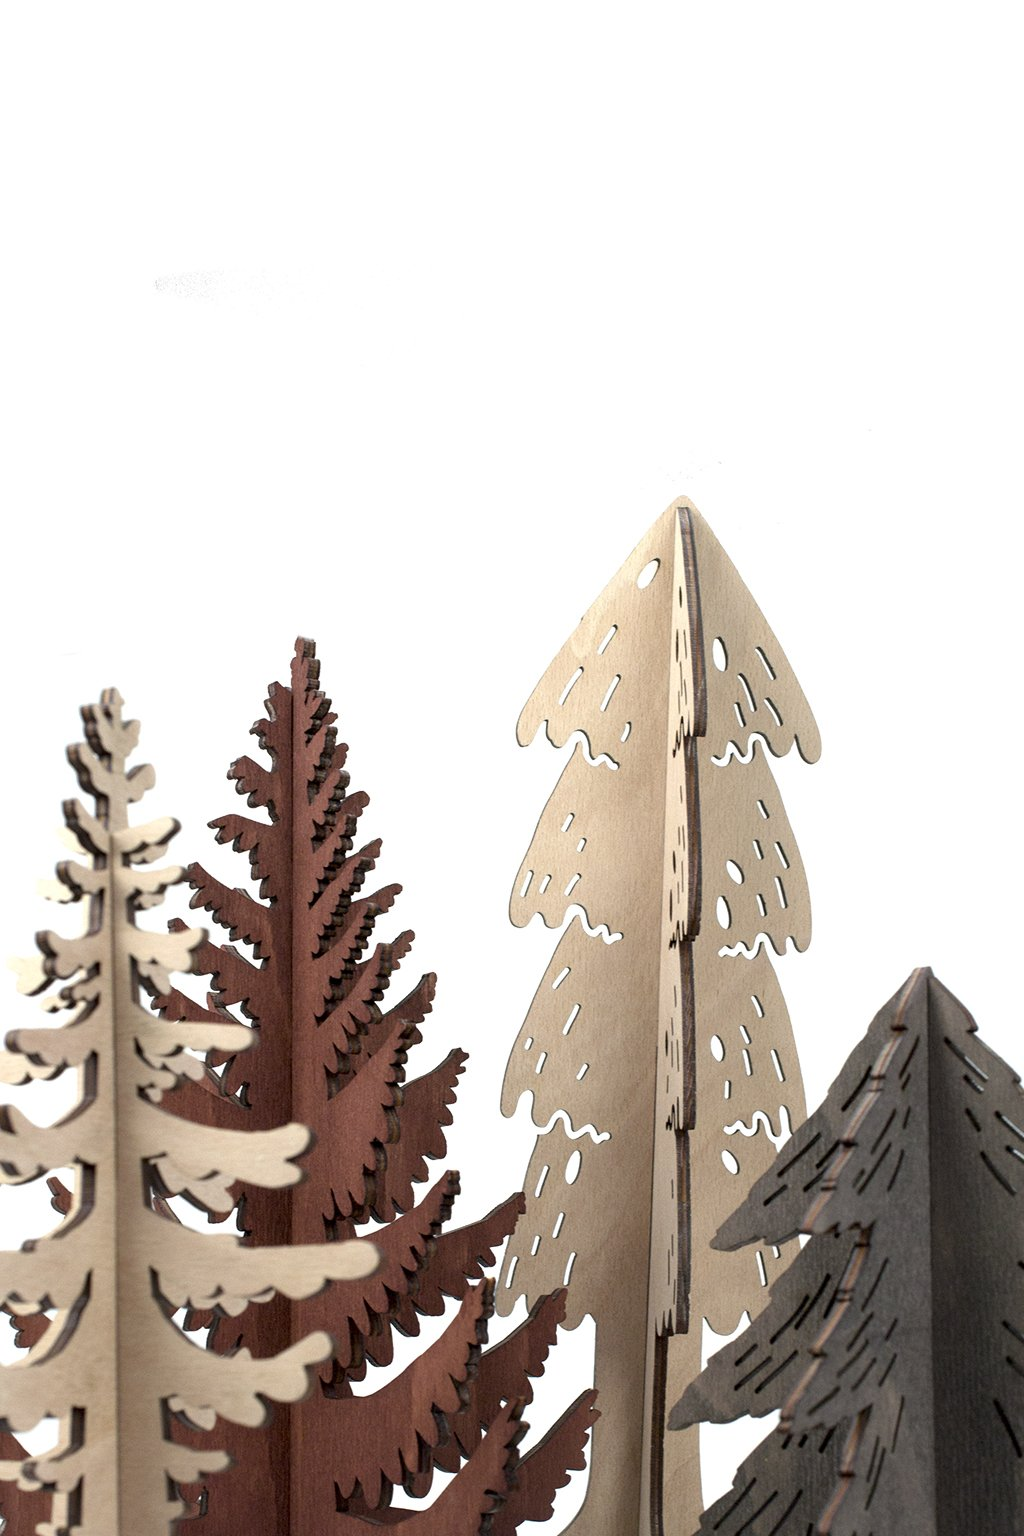 JAATY_vanocni-dekorace-dreveny-strom-kouzelny-les